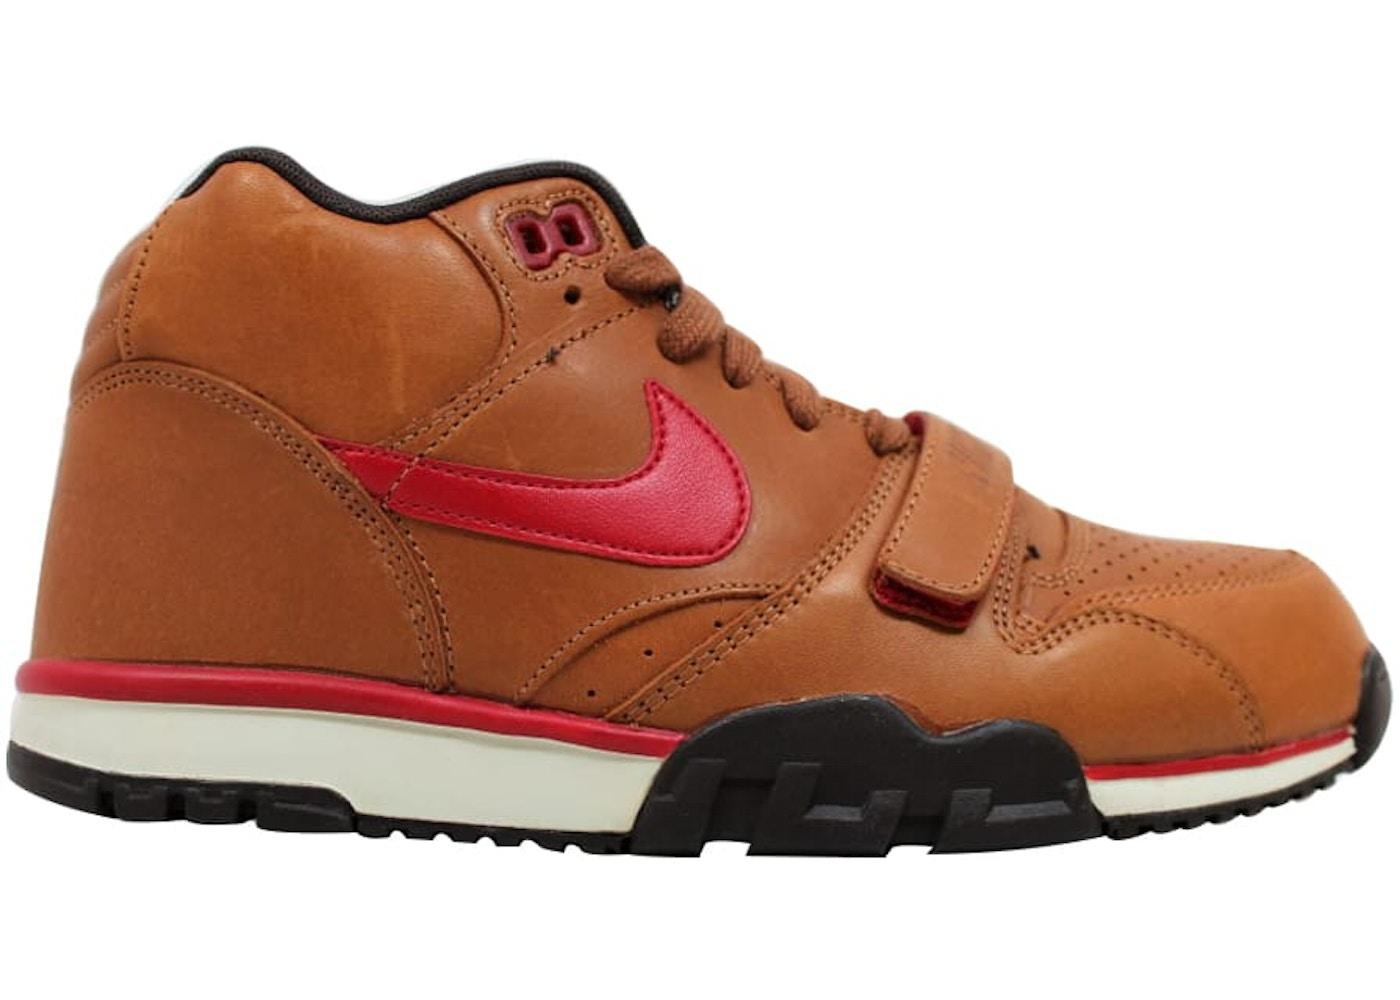 meilleure sélection d16d1 6447c Nike Air Trainer 1 Mid Premium Hazelnut/Gym Red-Baroque Brown-Birch